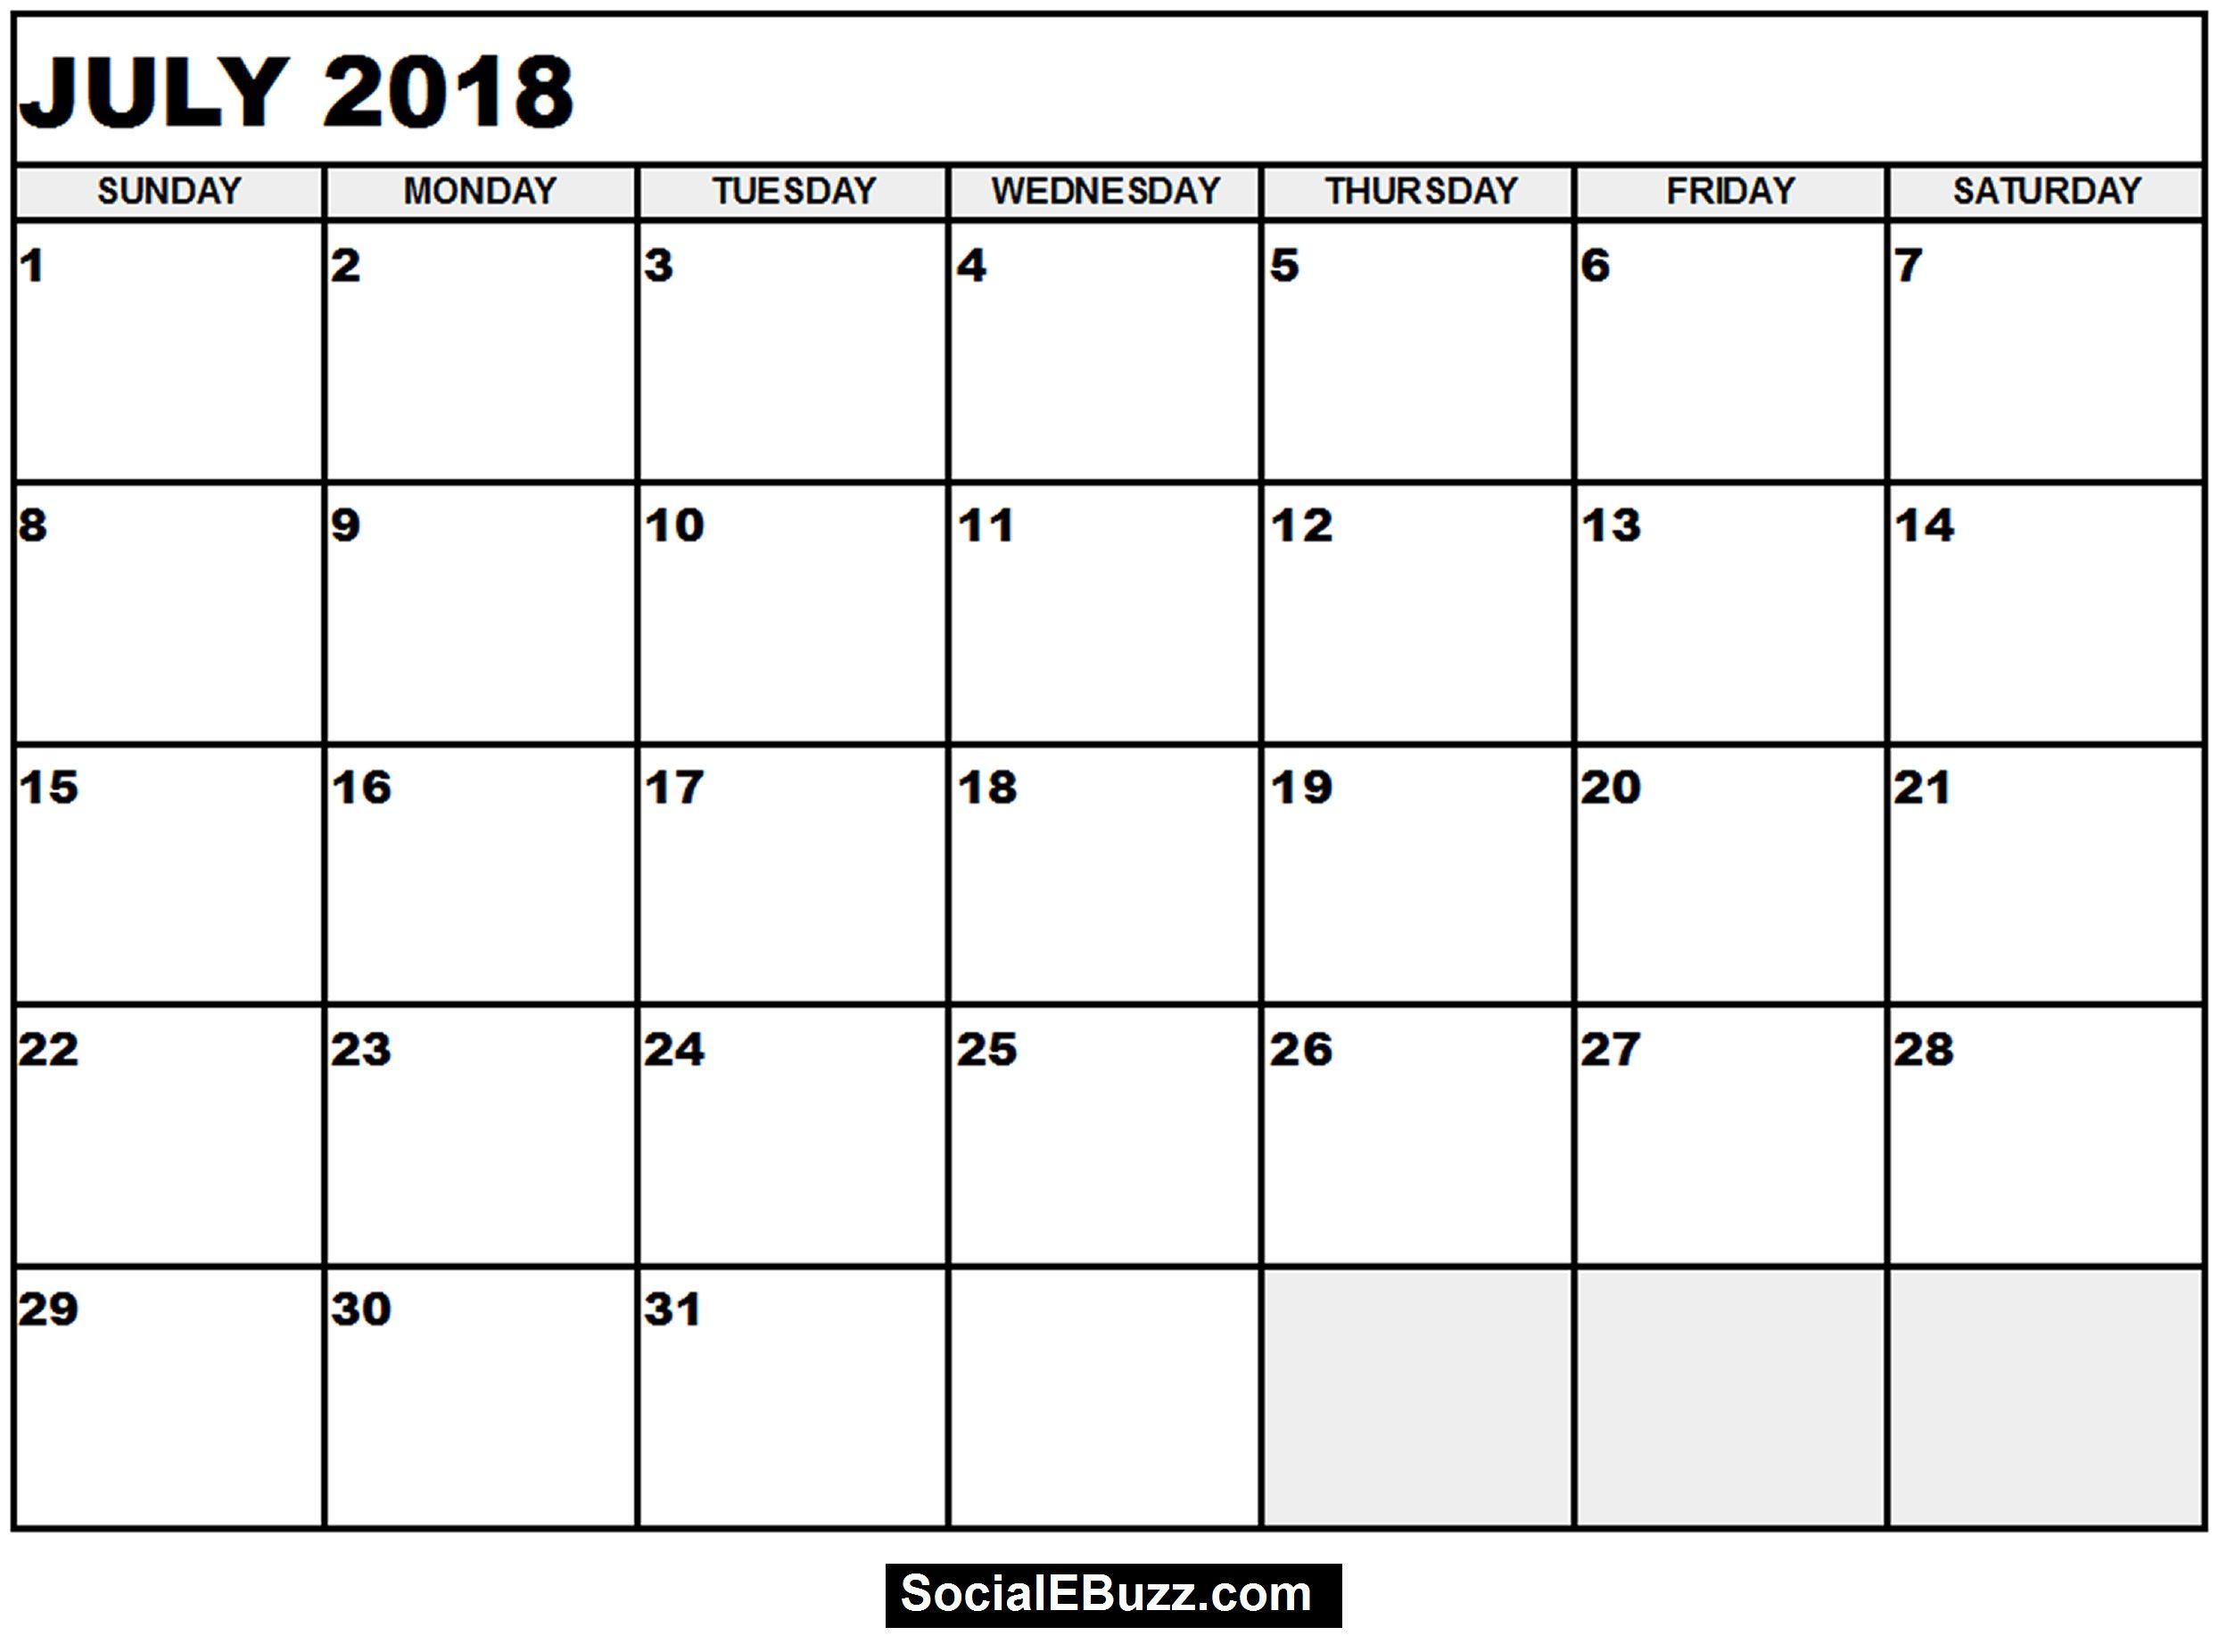 July 2018 Calendar Word Format